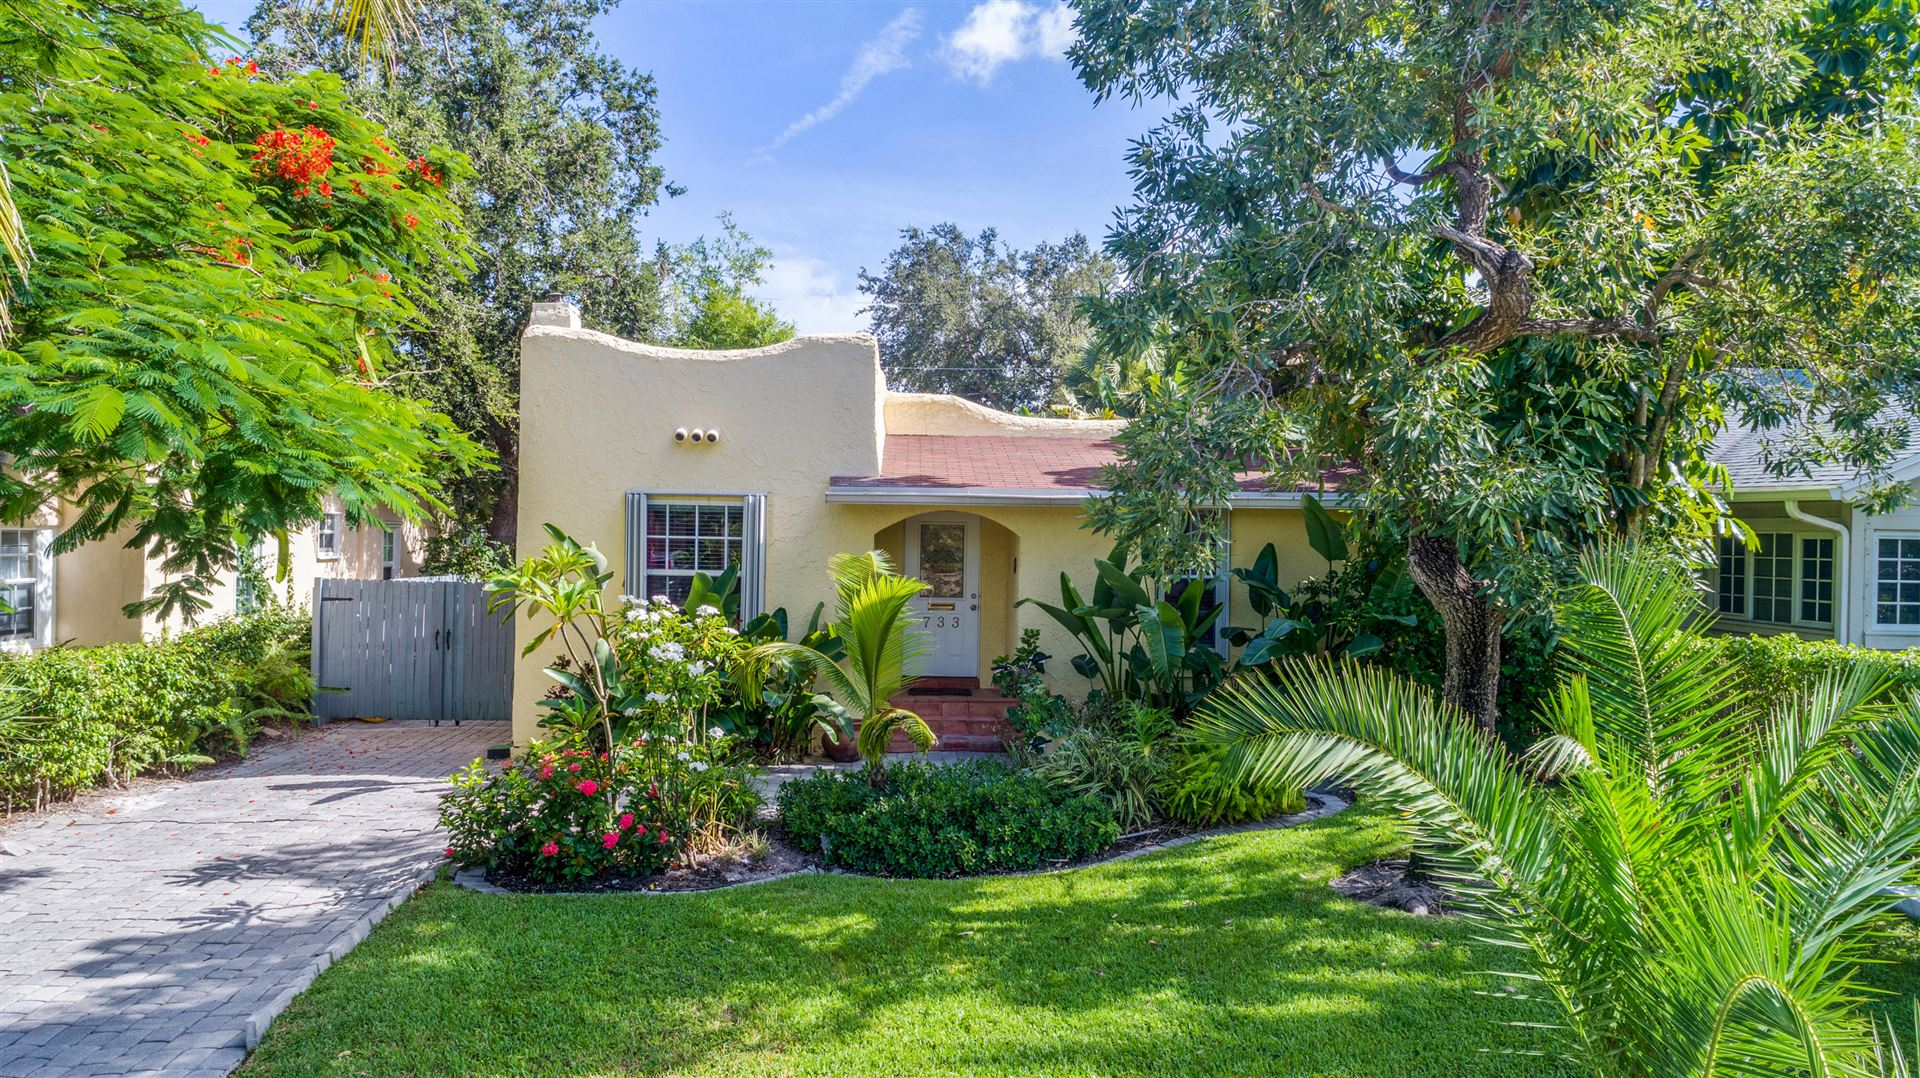 733 New Jersey Street, West Palm Beach, FL 33401 - #: RX-10651529